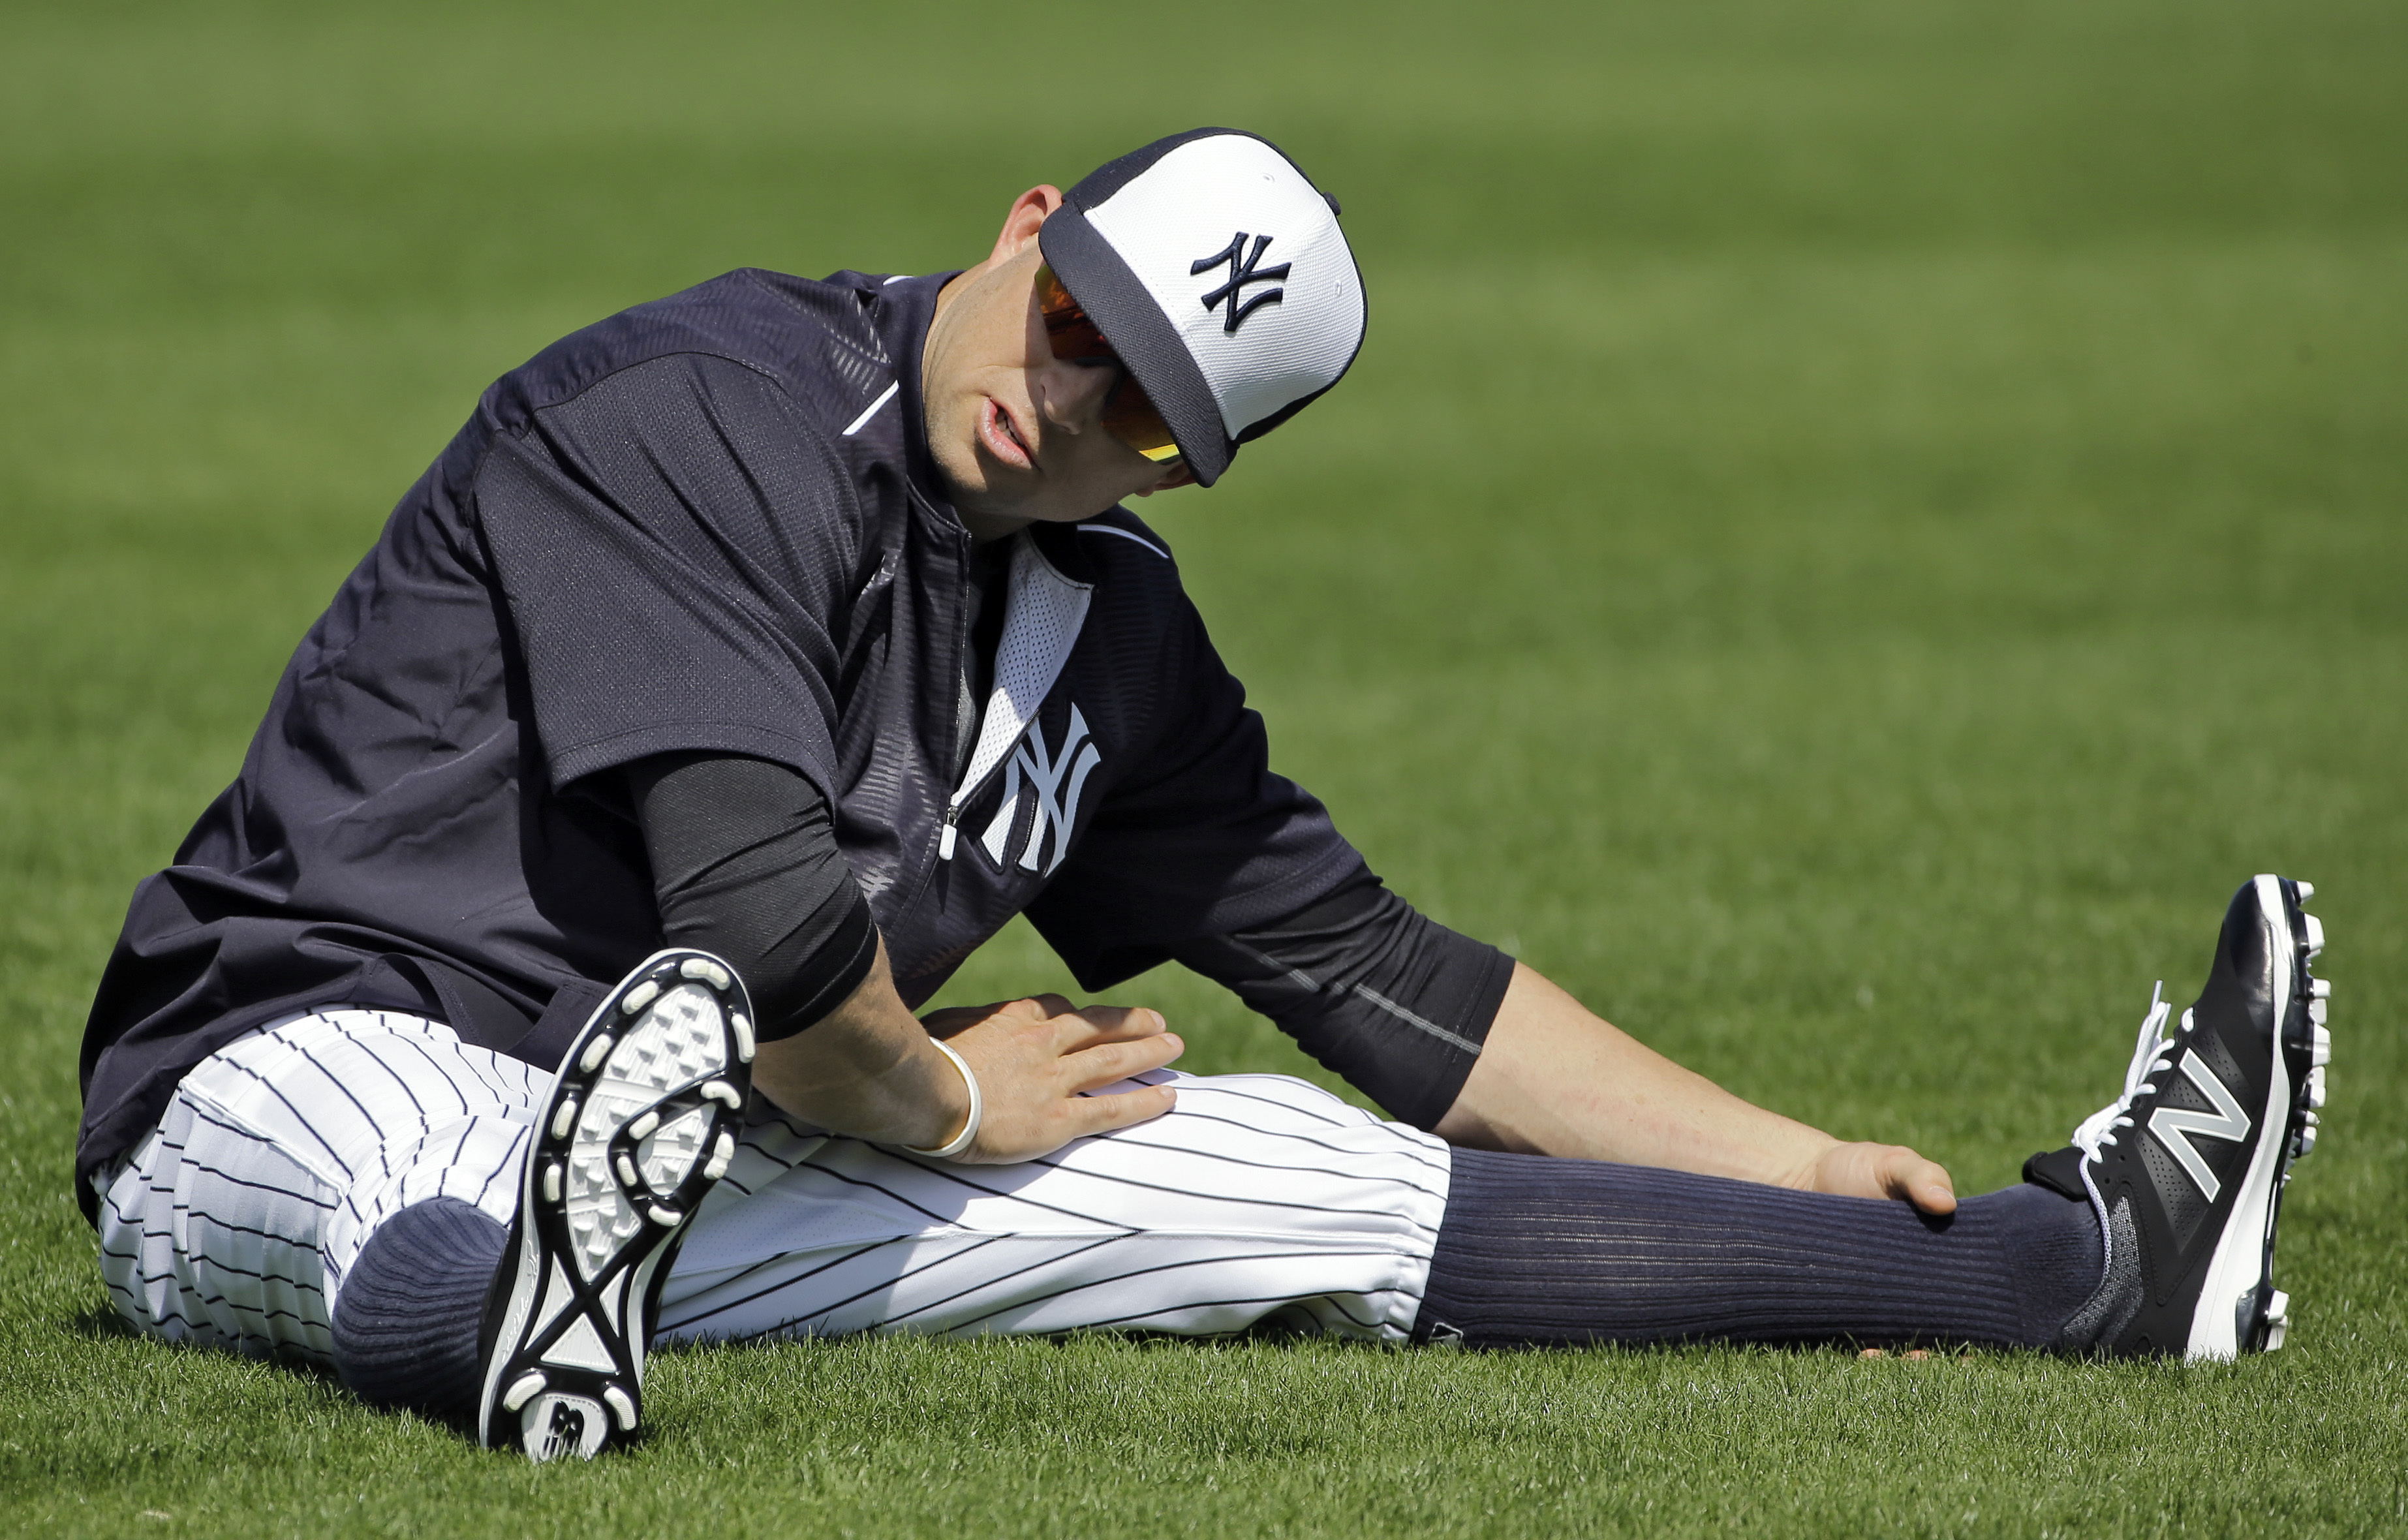 New York Yankees Brett Gardner stretches during a spring training baseball workout Thursday, Feb. 25, 2016, in Tampa, Fla. (AP Photo/Chris O'Meara)